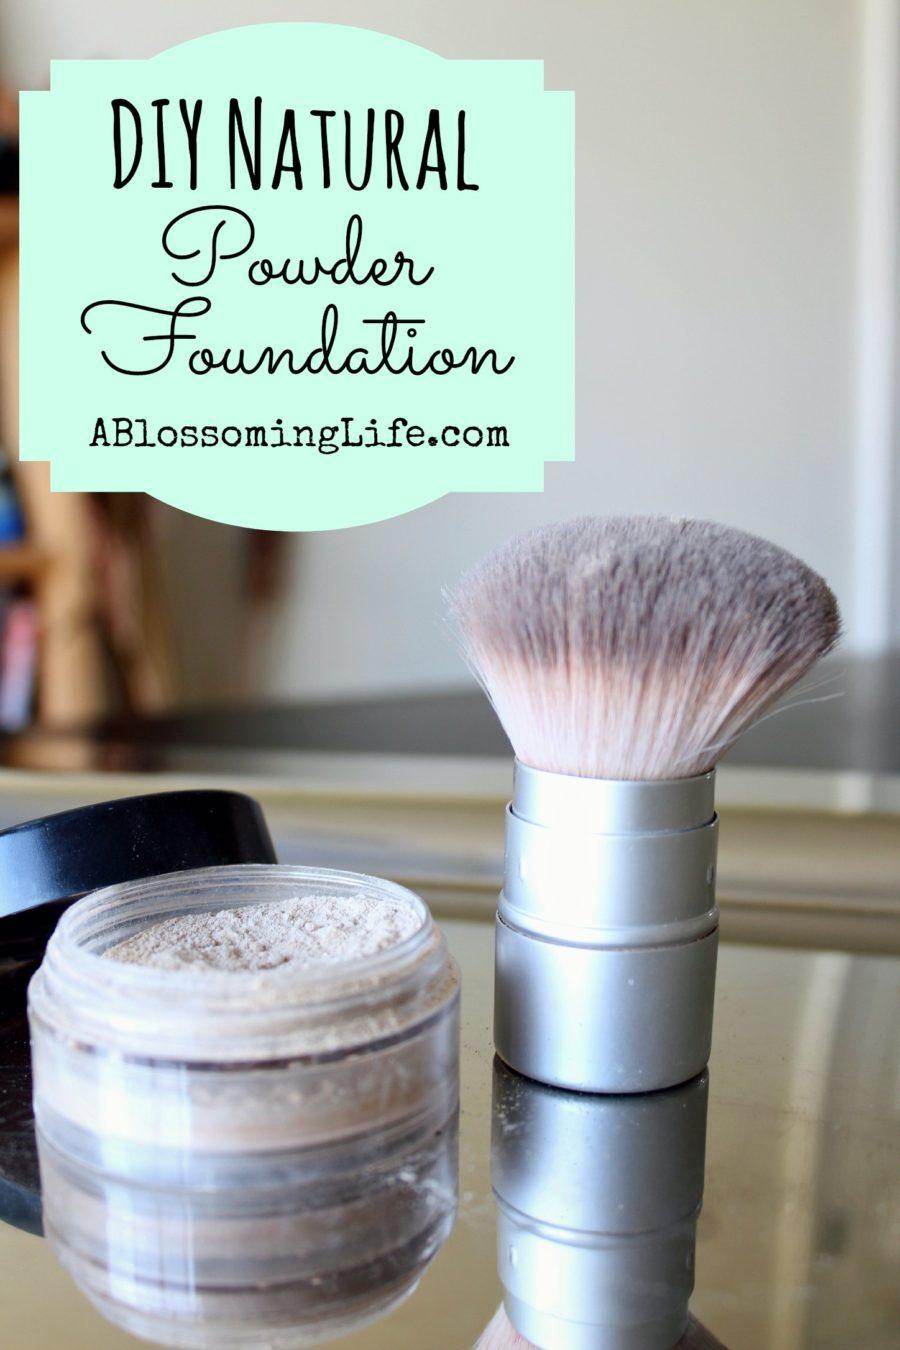 Homemade natural eyebrow filler diy natural powder foundation solutioingenieria Images